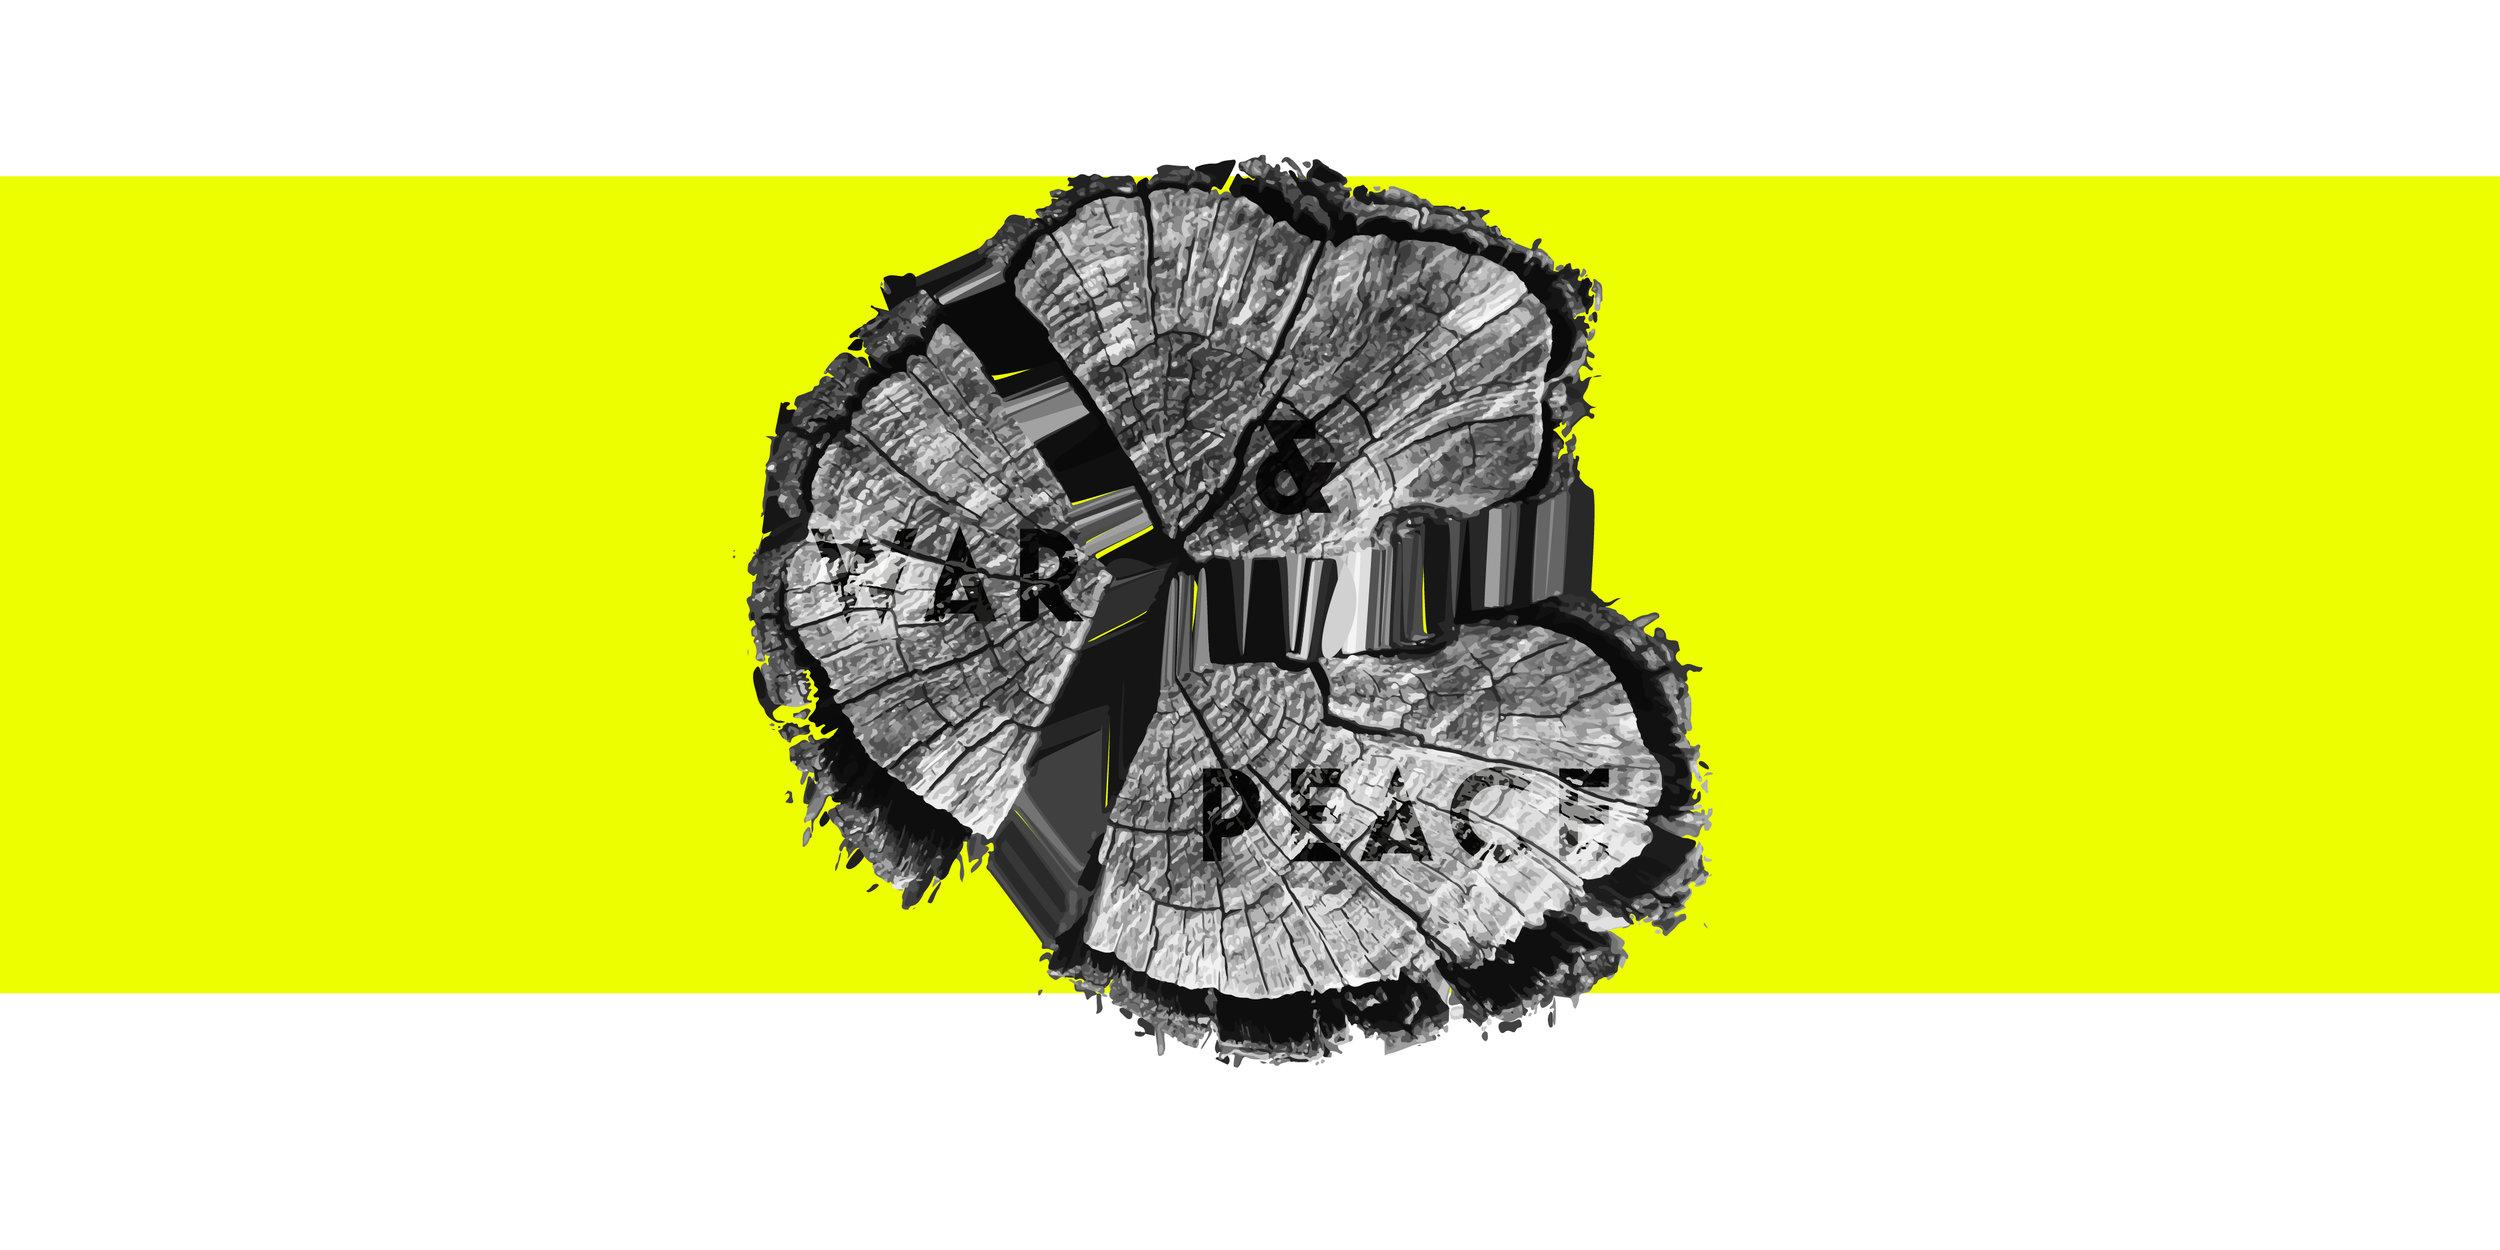 laba-journal-war-peace-stump-01.jpg